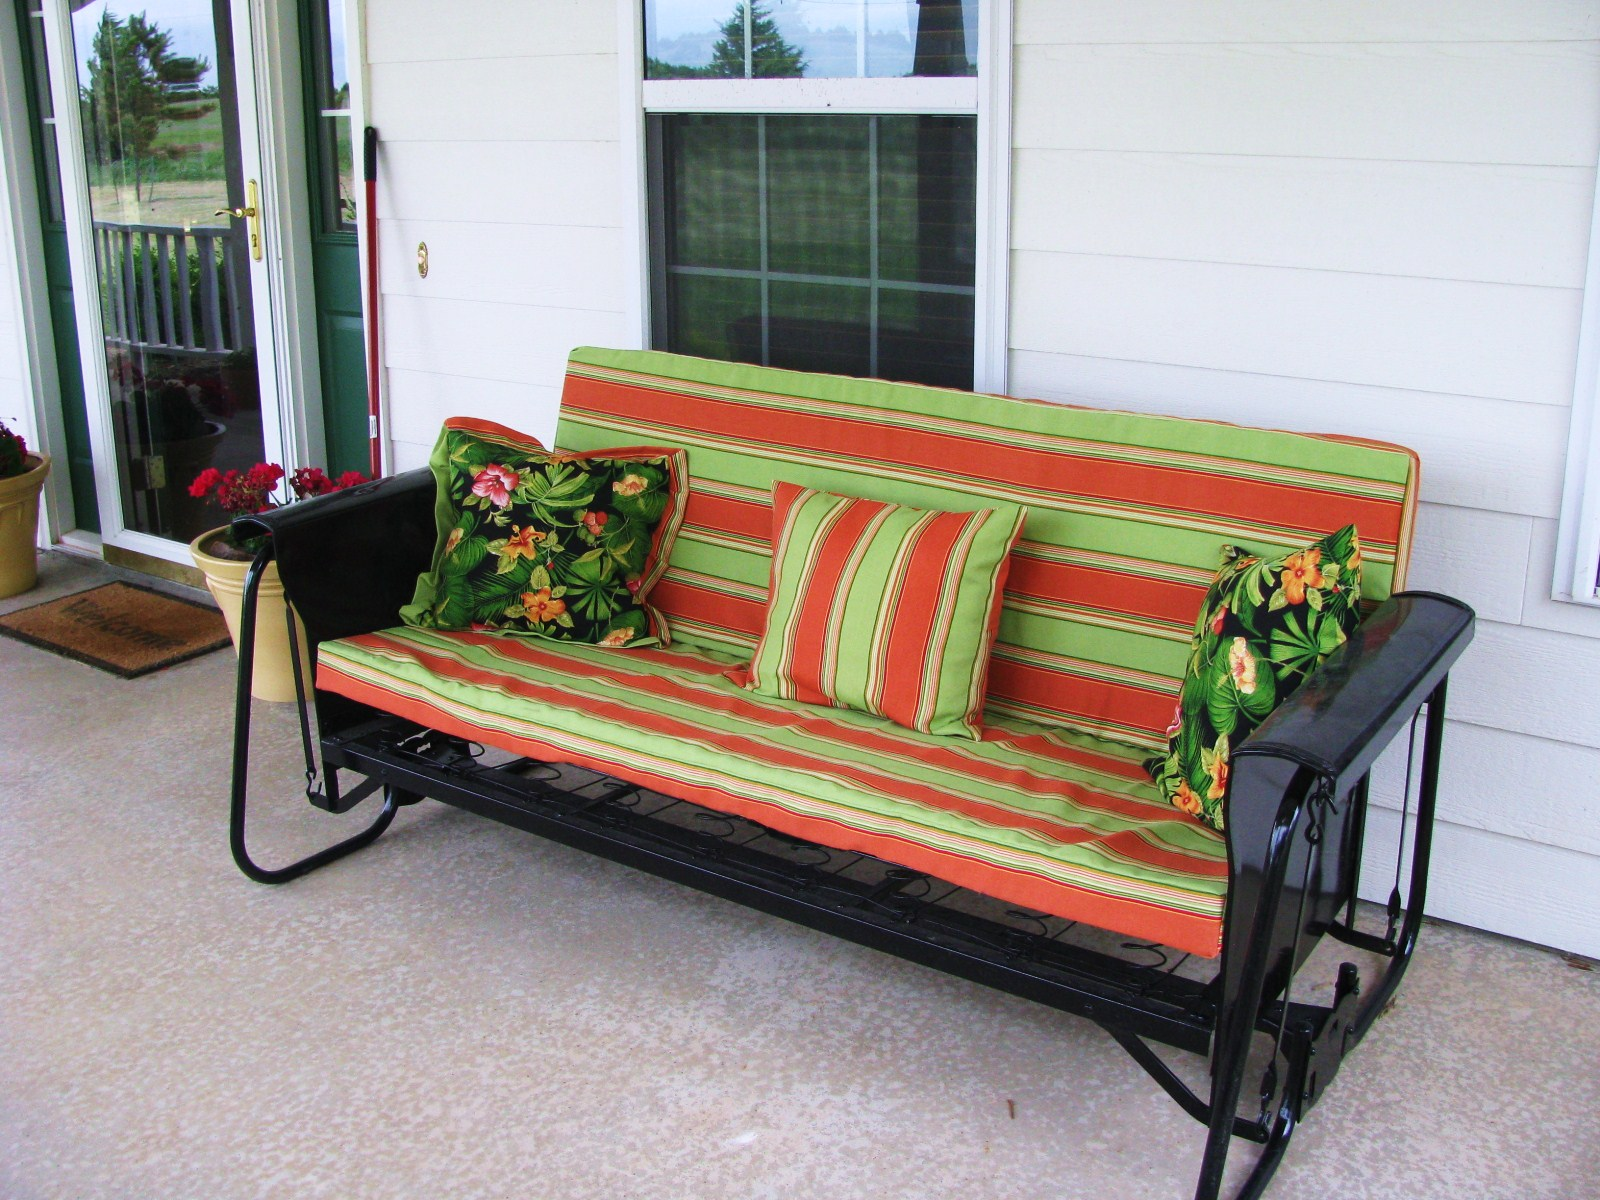 Desperately Creative: Antique Porch Glider